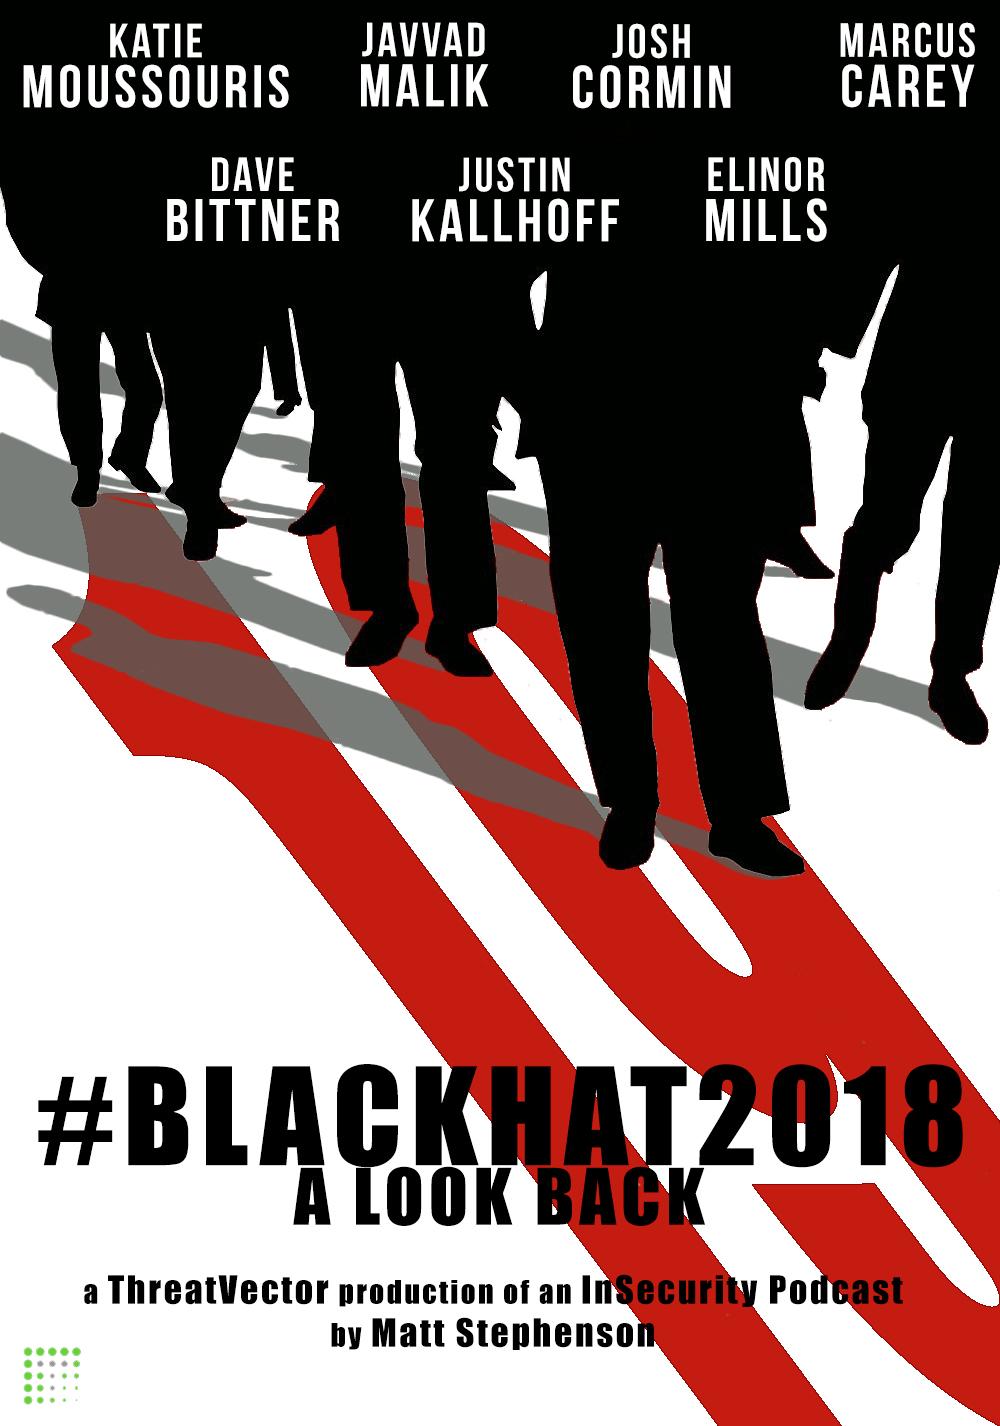 #BlackHat2018 A Look Back